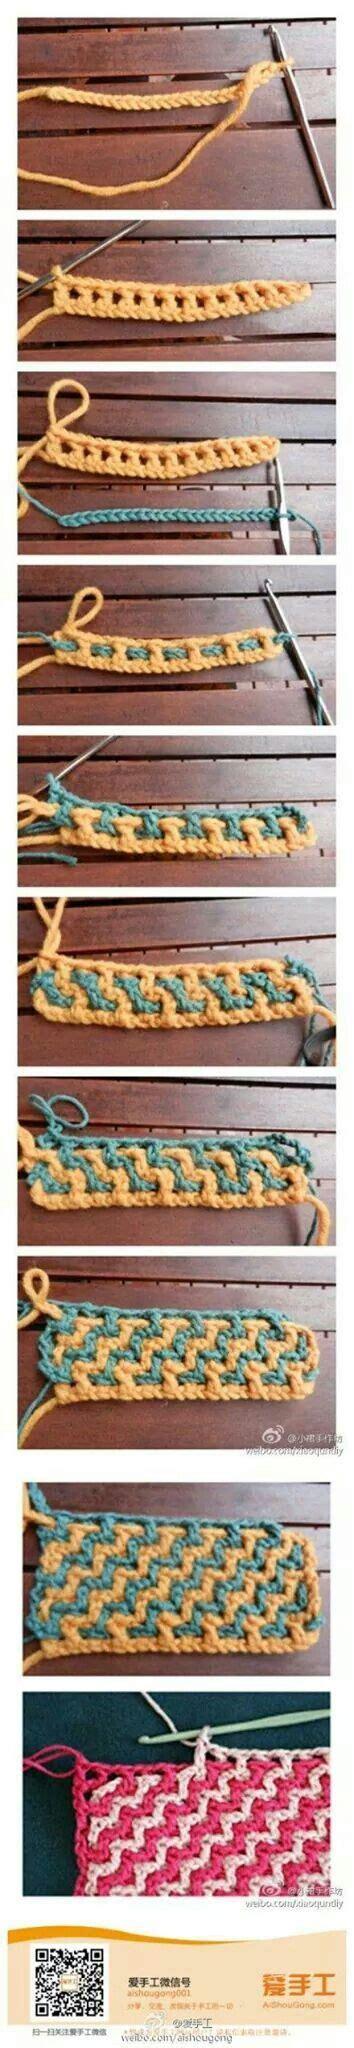 interlocking crochet zig zag pattern 17 best images about interlocking crochet on pinterest